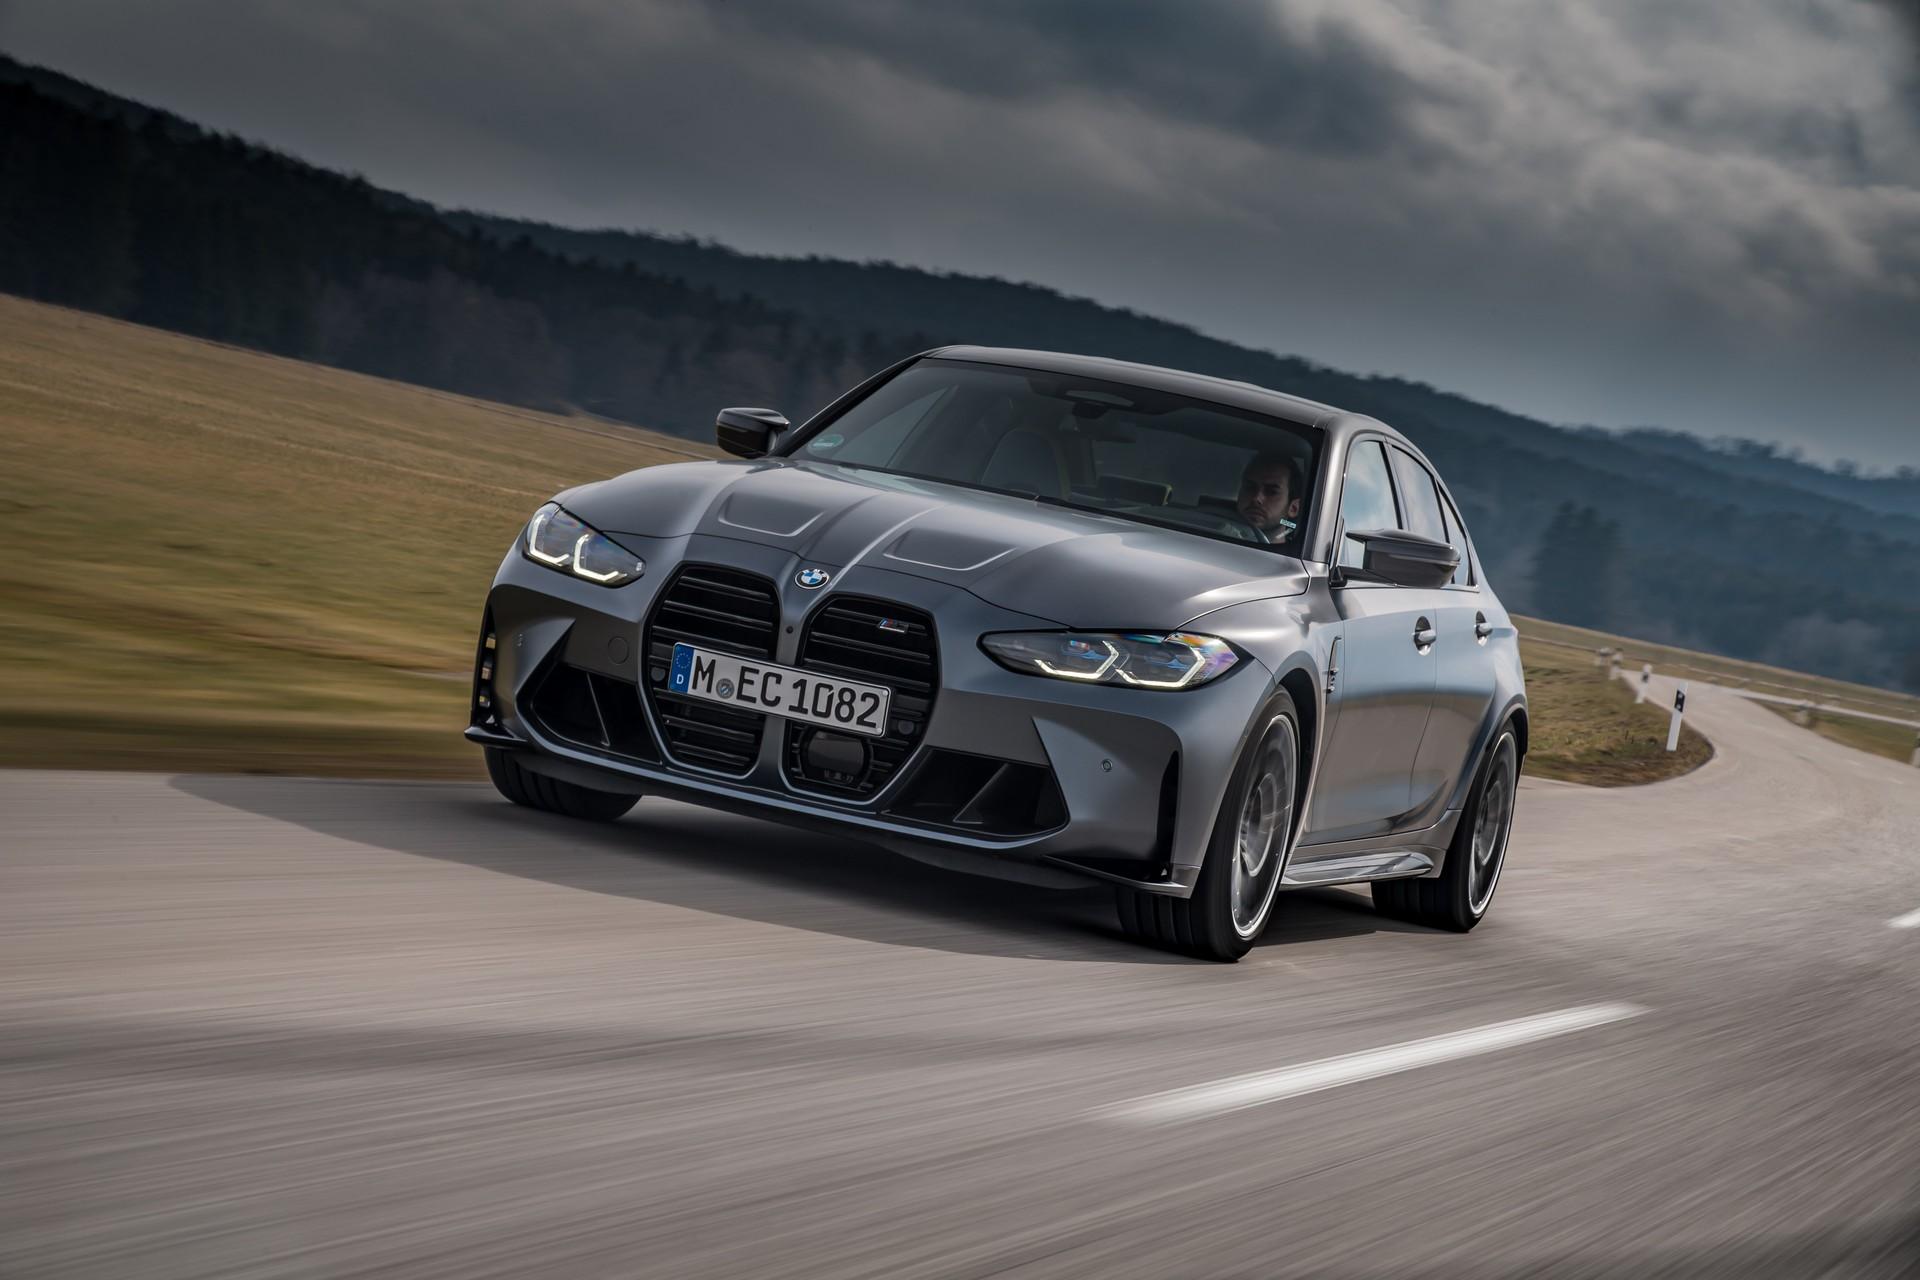 BMW-M3-M4-Competition-xDrive-52.jpg